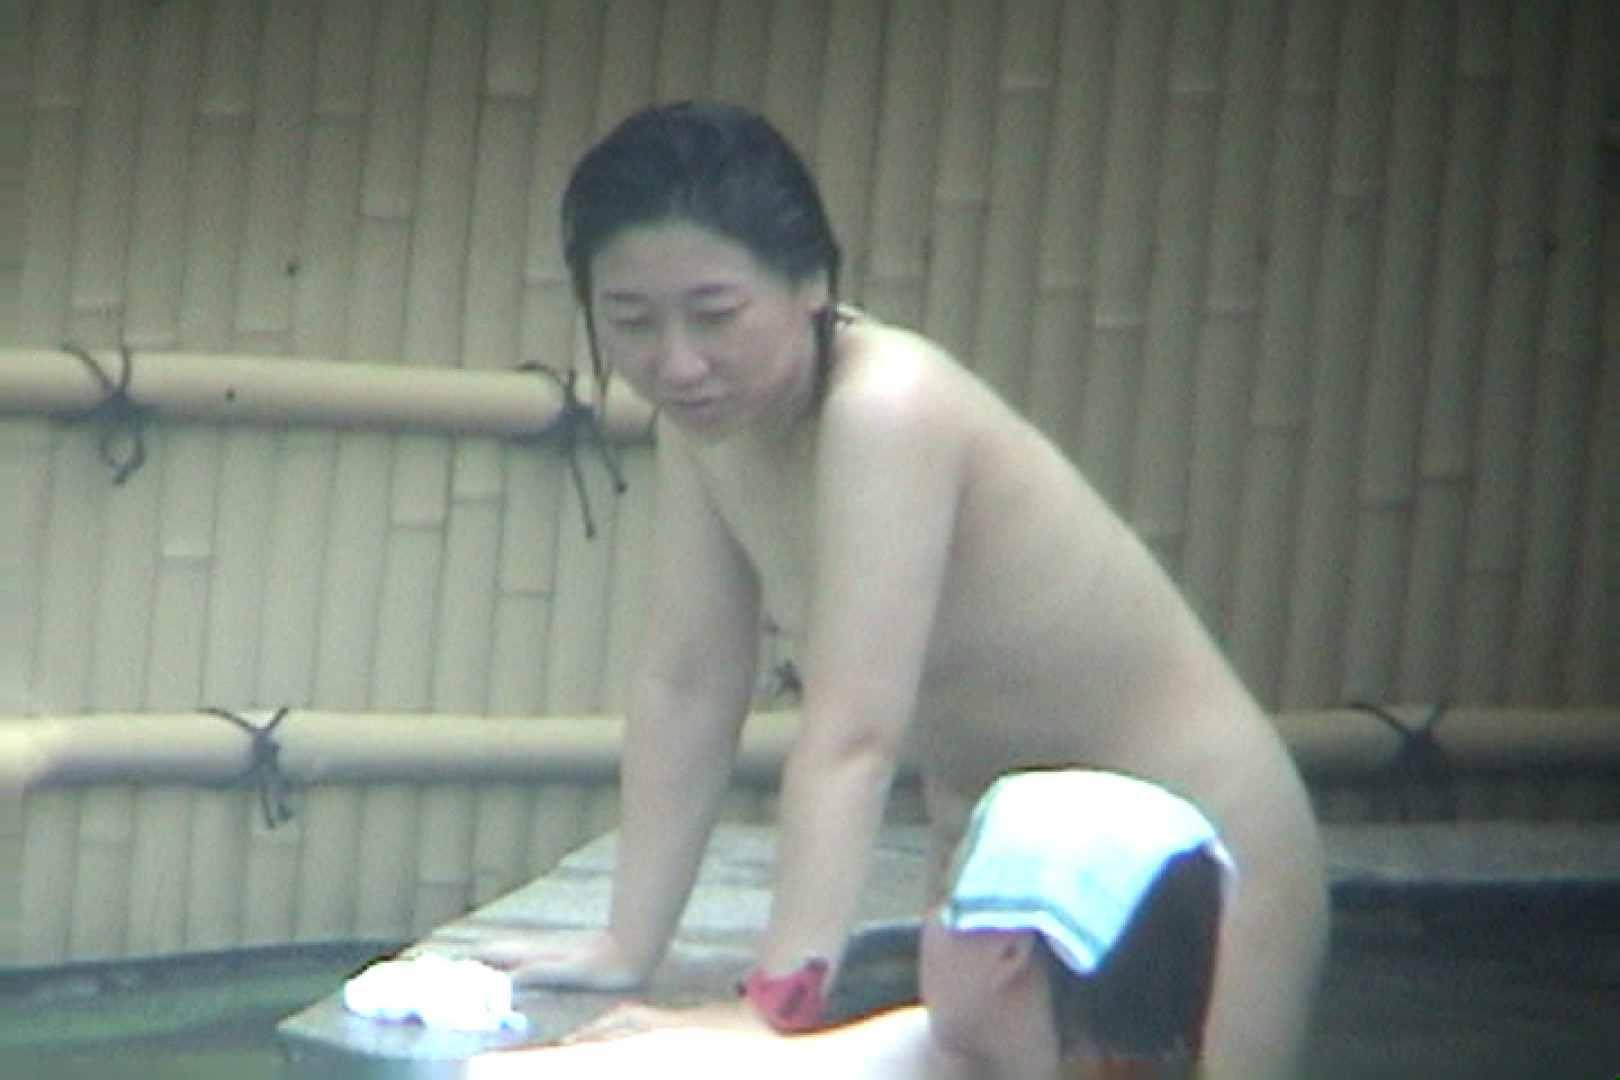 Aquaな露天風呂Vol.107 露天風呂編  111PIX 2